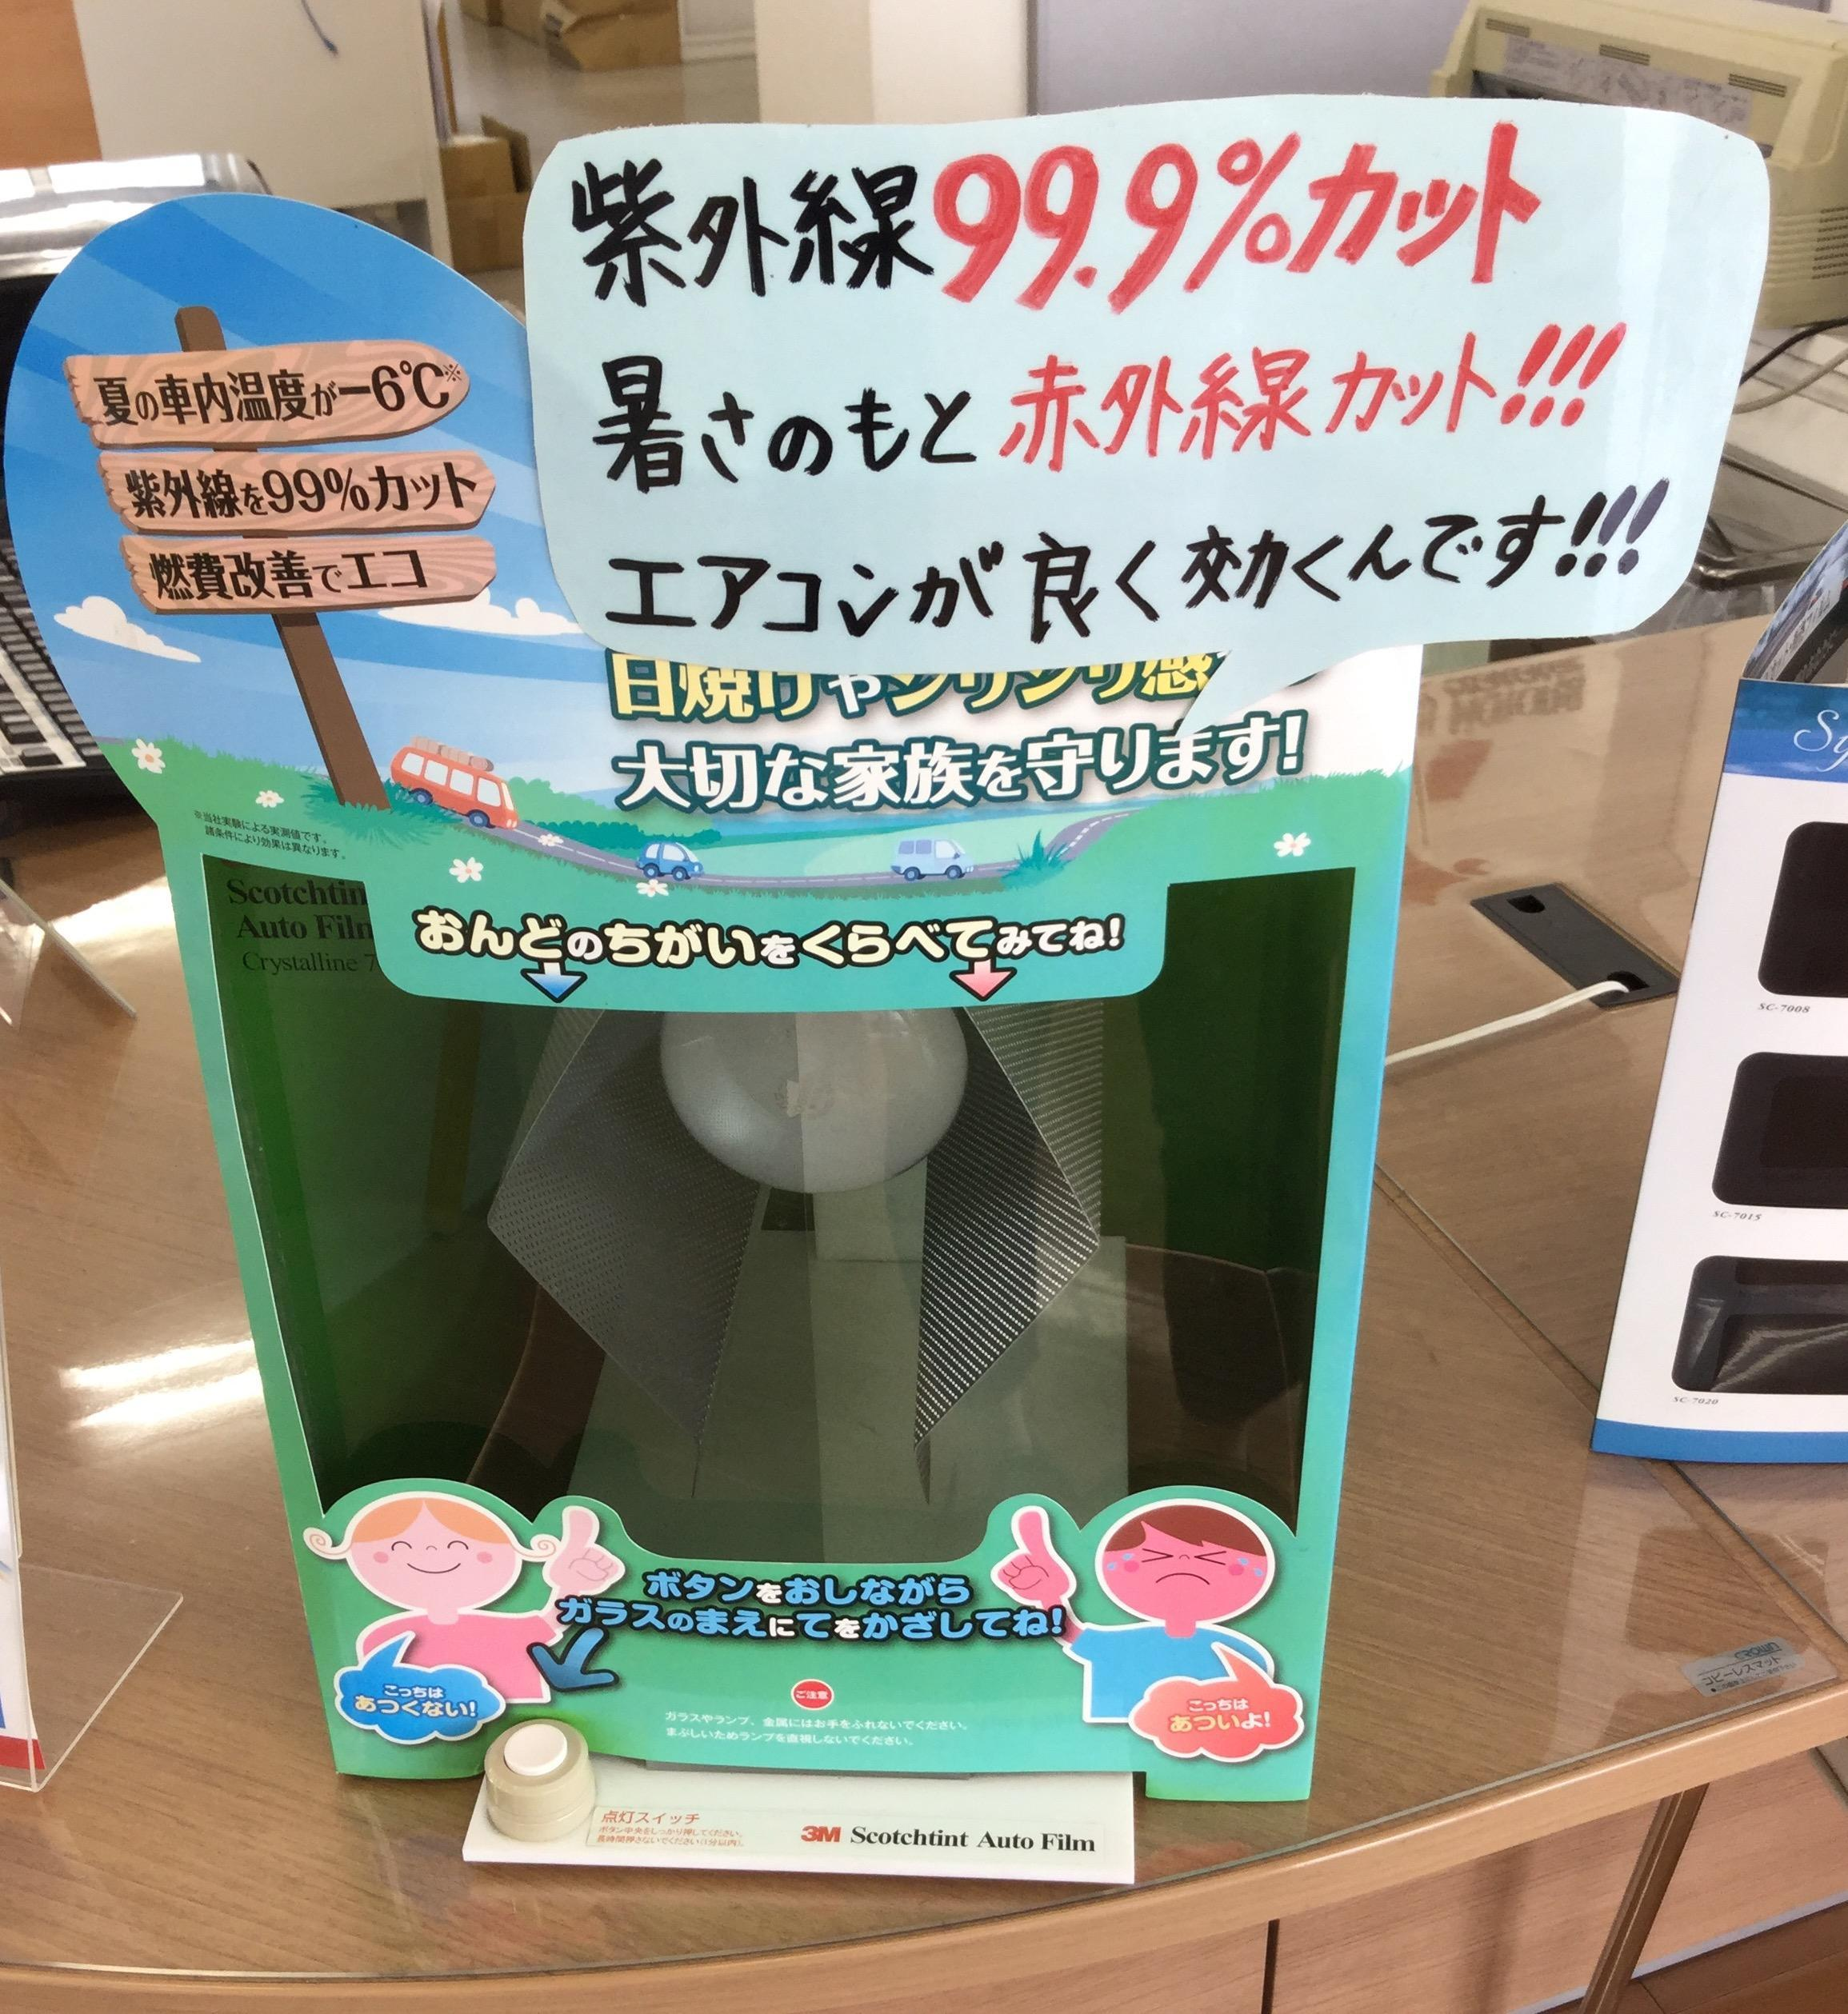 https://www.hyogo-mitsubishi.com/shop/akashi/files/IMG_0121.JPG